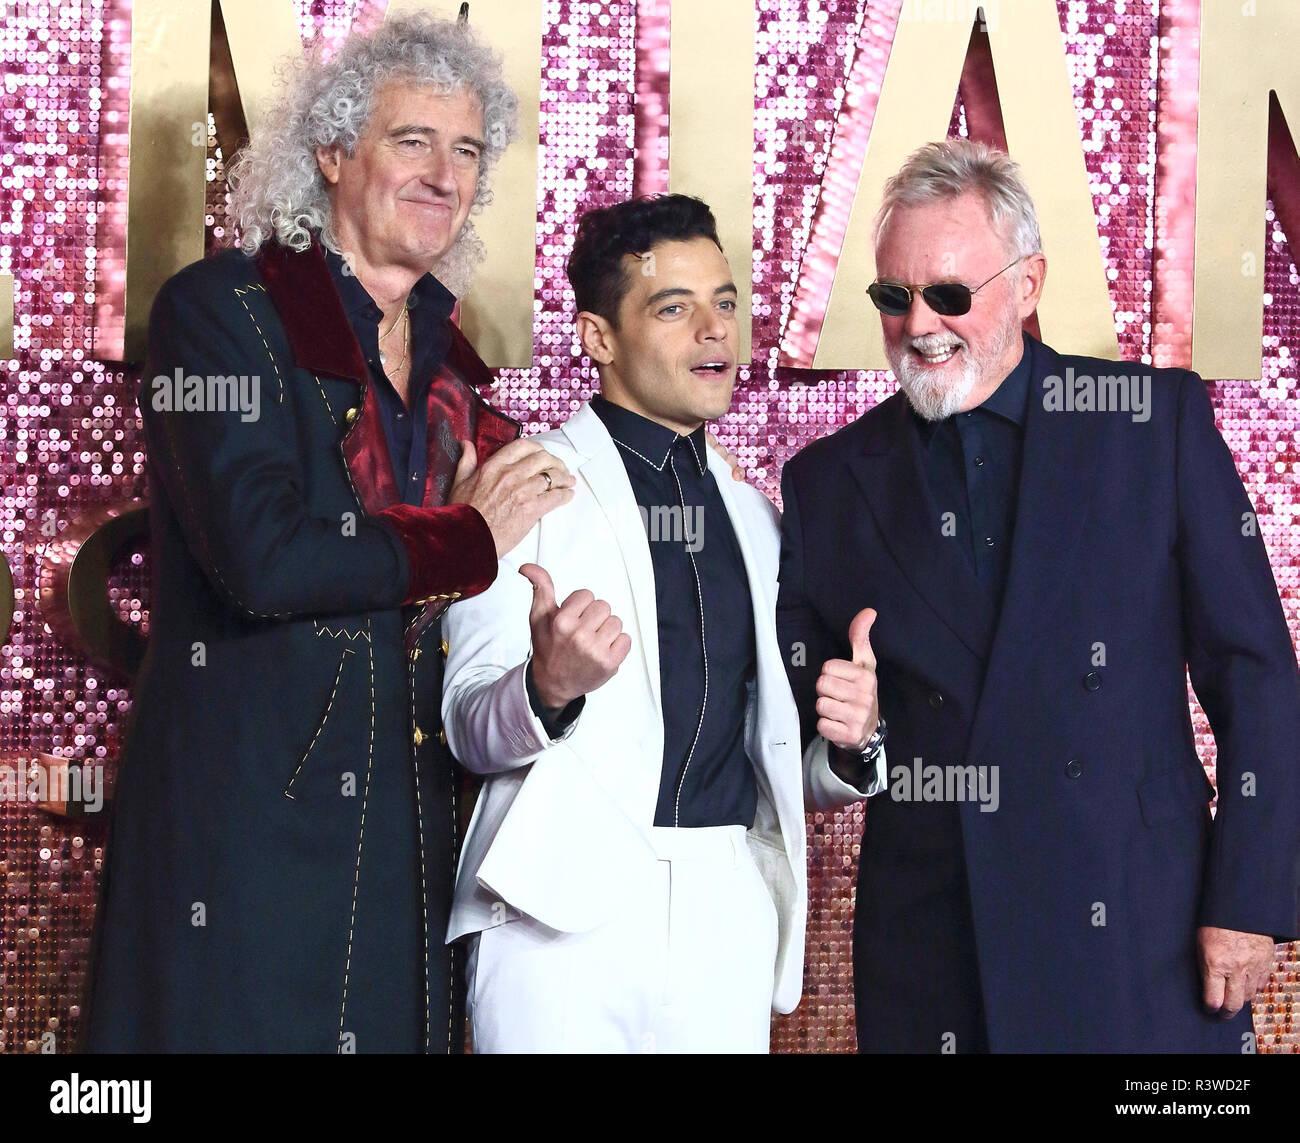 Bohemian Rhapsody UK Premiere au SSE Arena Wembley, Londres avec: Brian May, Rami Malek, Roger Taylor Où: London, Royaume-Uni Quand: 23 Oct 2018 Source: WENN.com Banque D'Images